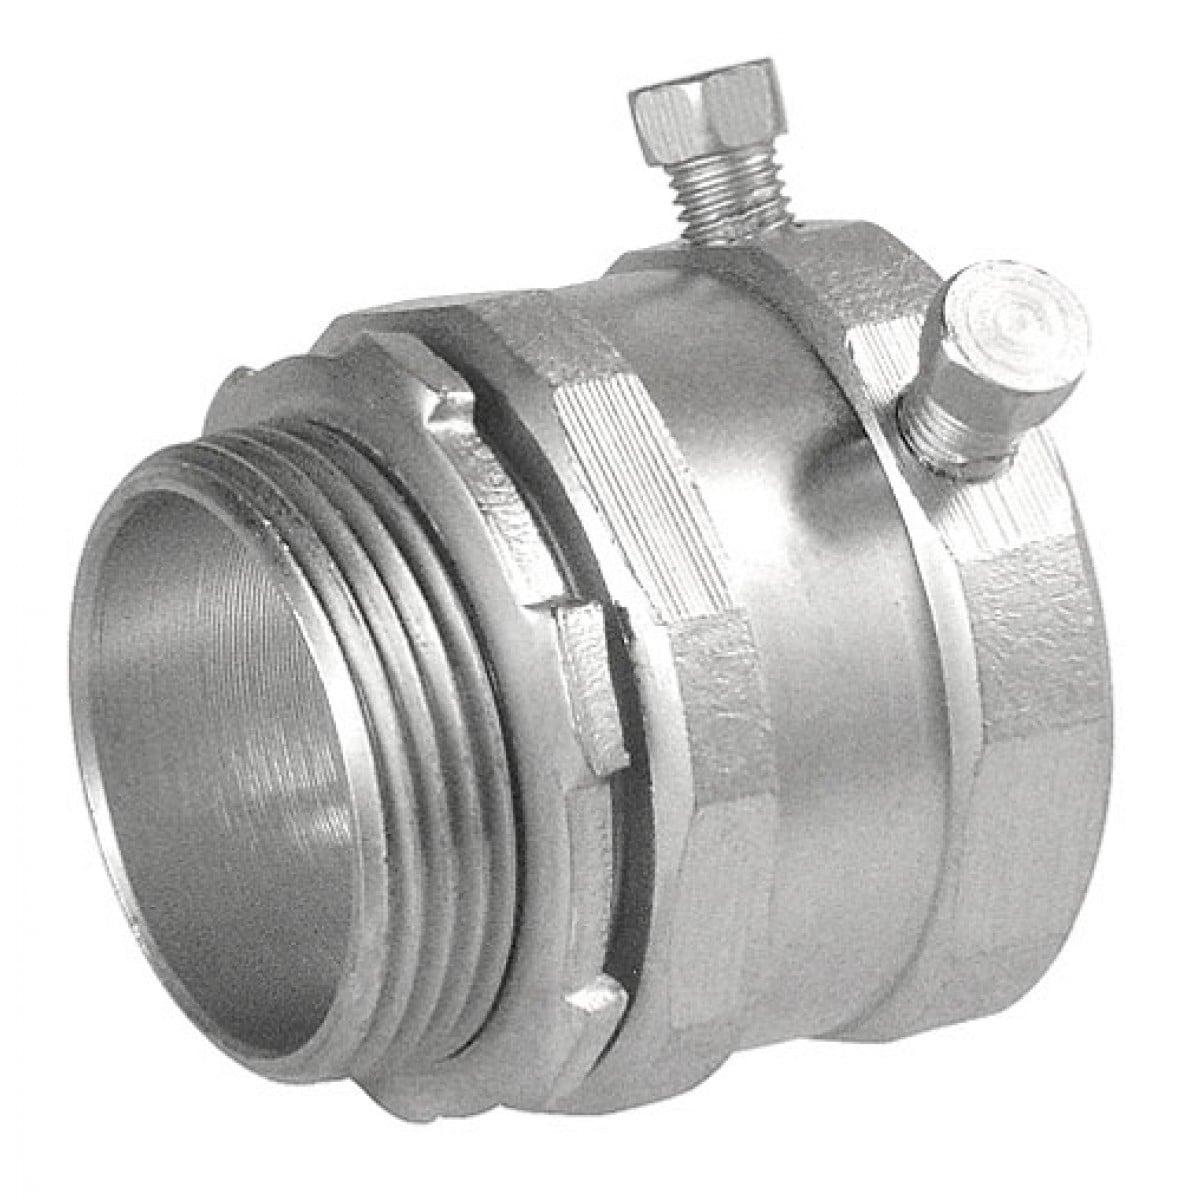 1 Pc, 3-1/2 in. Zinc Plated Steel Set Screw Connector, Steel